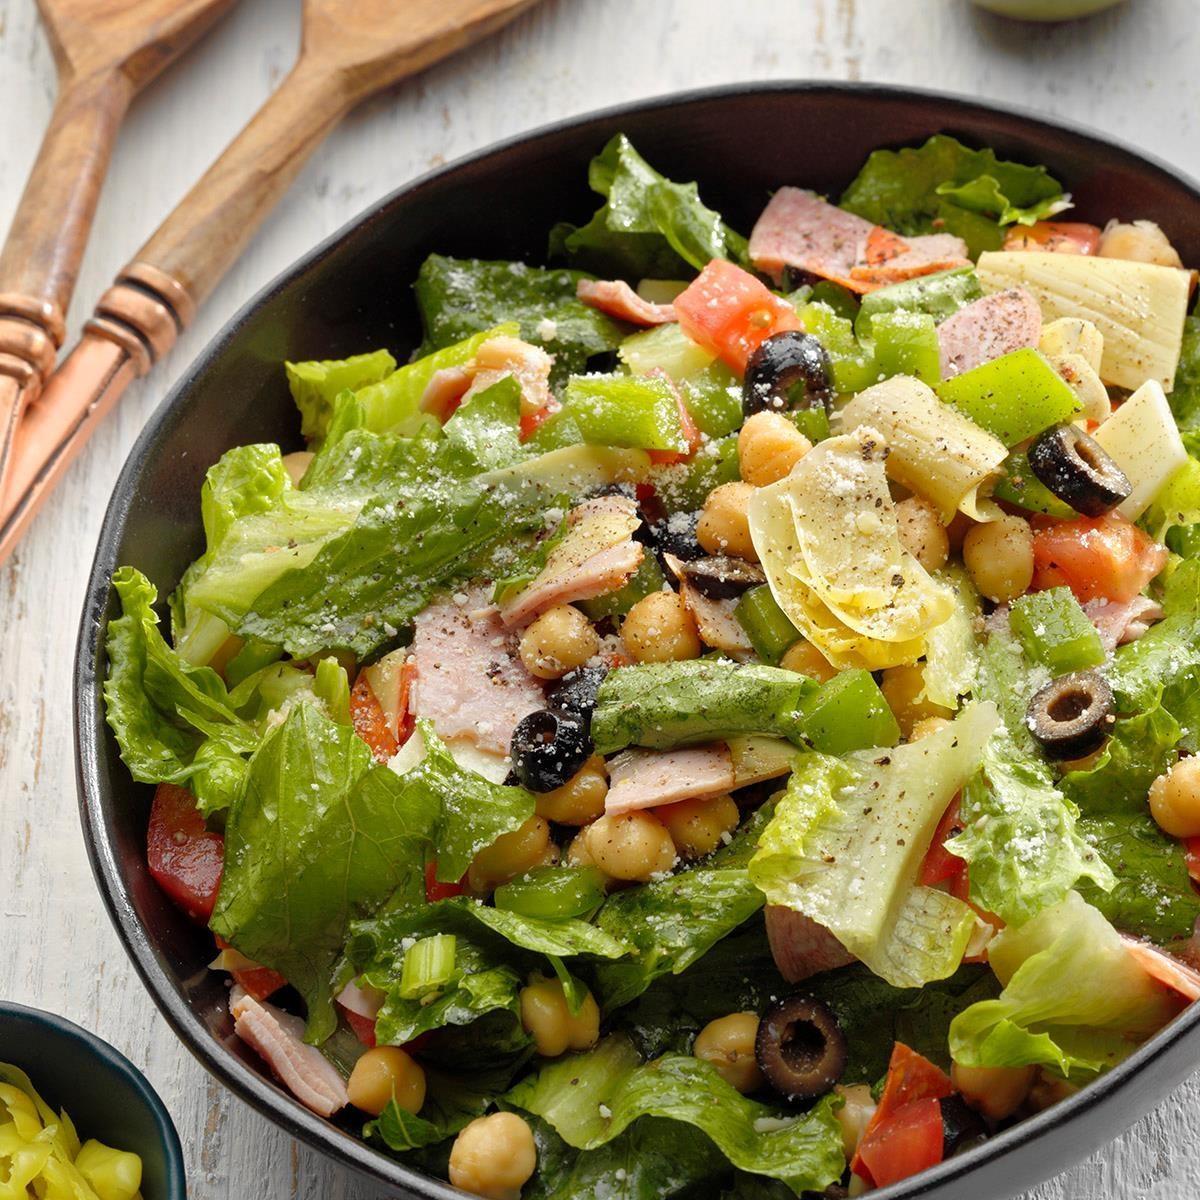 Super Italian Chopped Salad Exps Cimzw20 40326 B09 03 2b 3